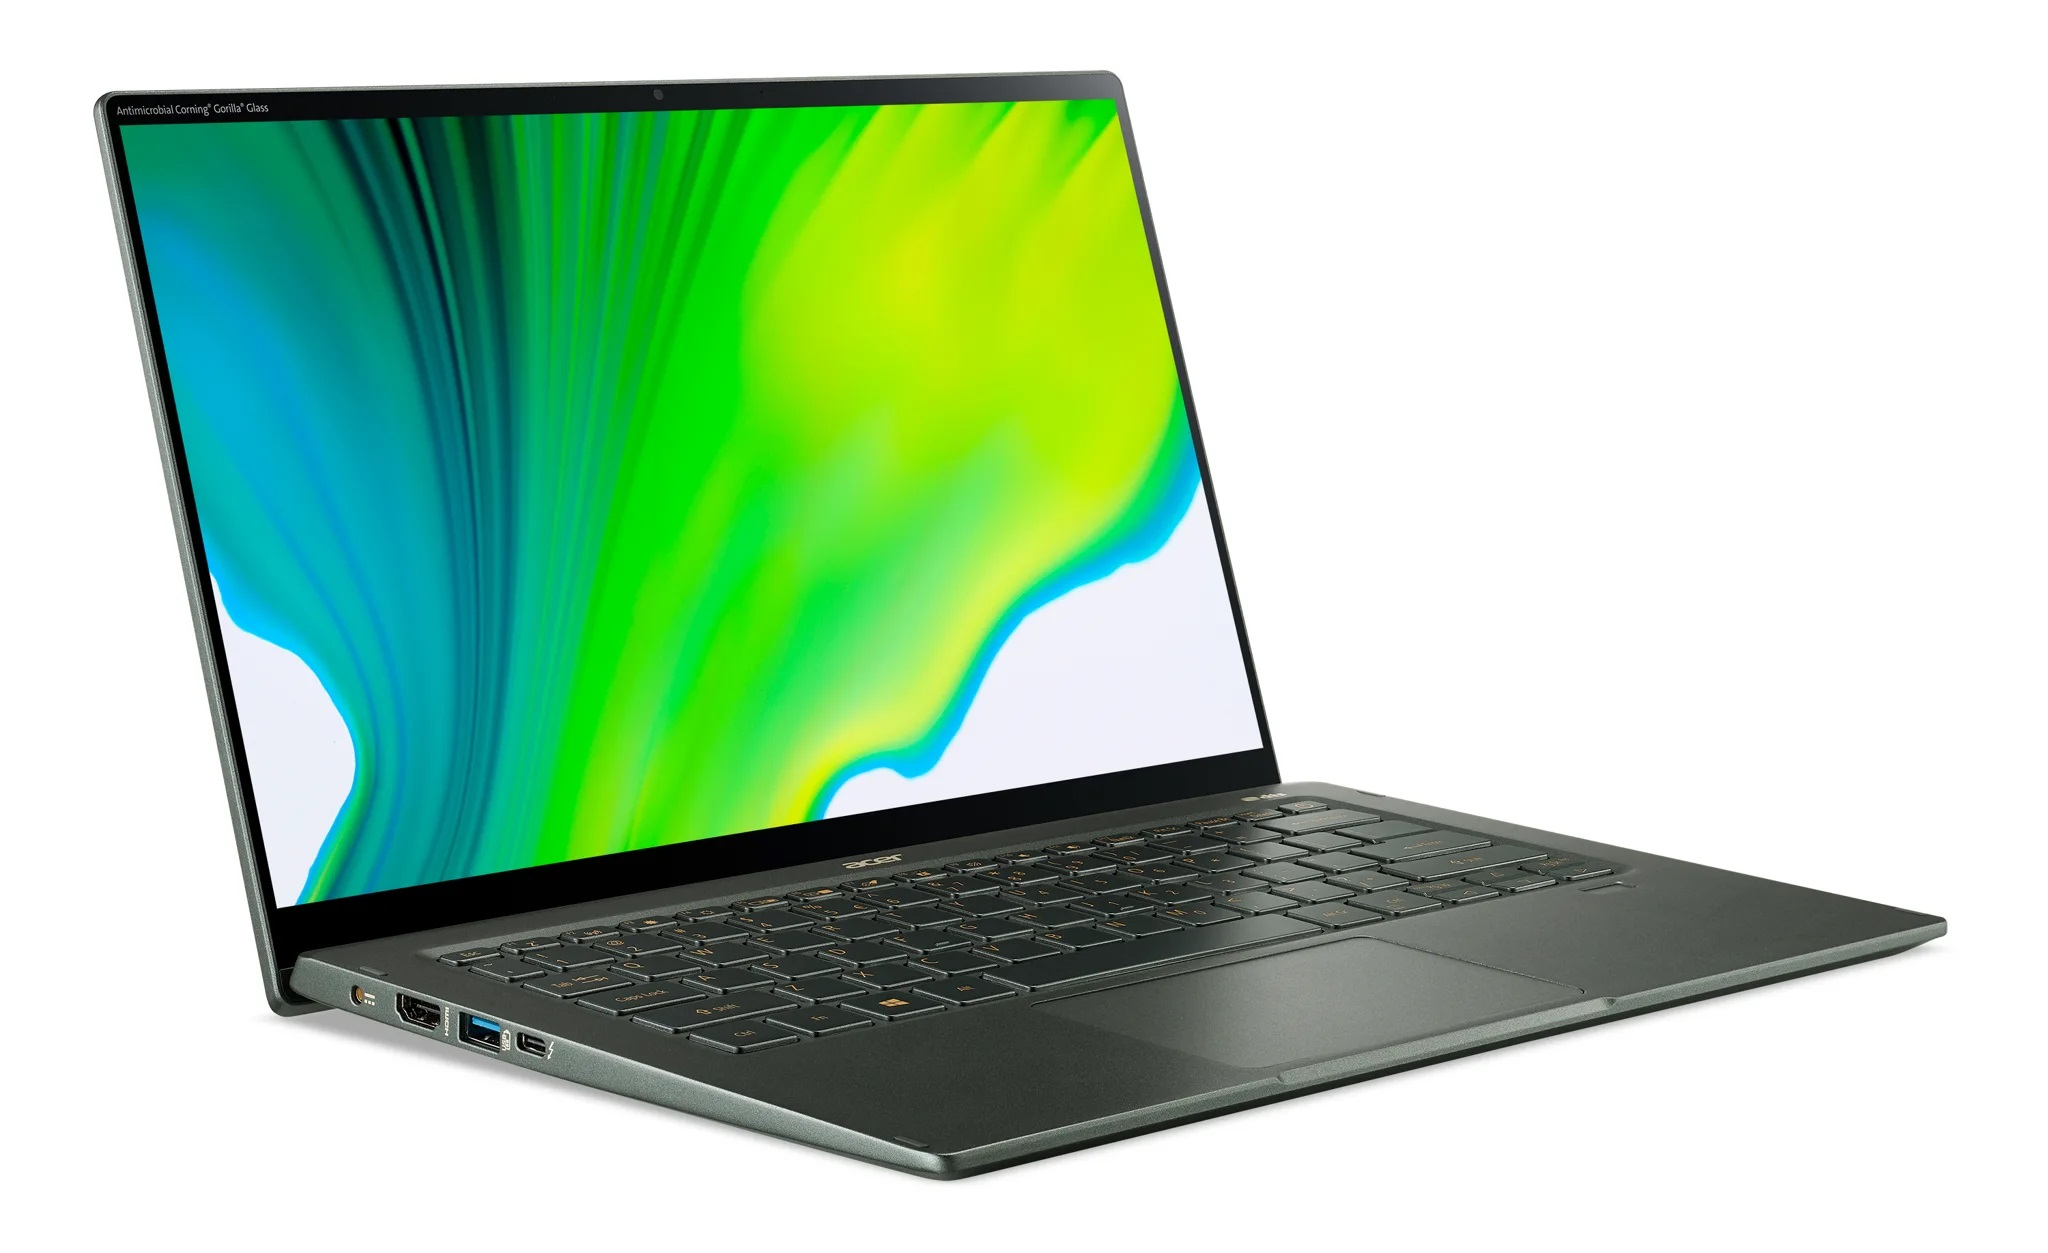 Acer Swift 5 SF514-55 laptop